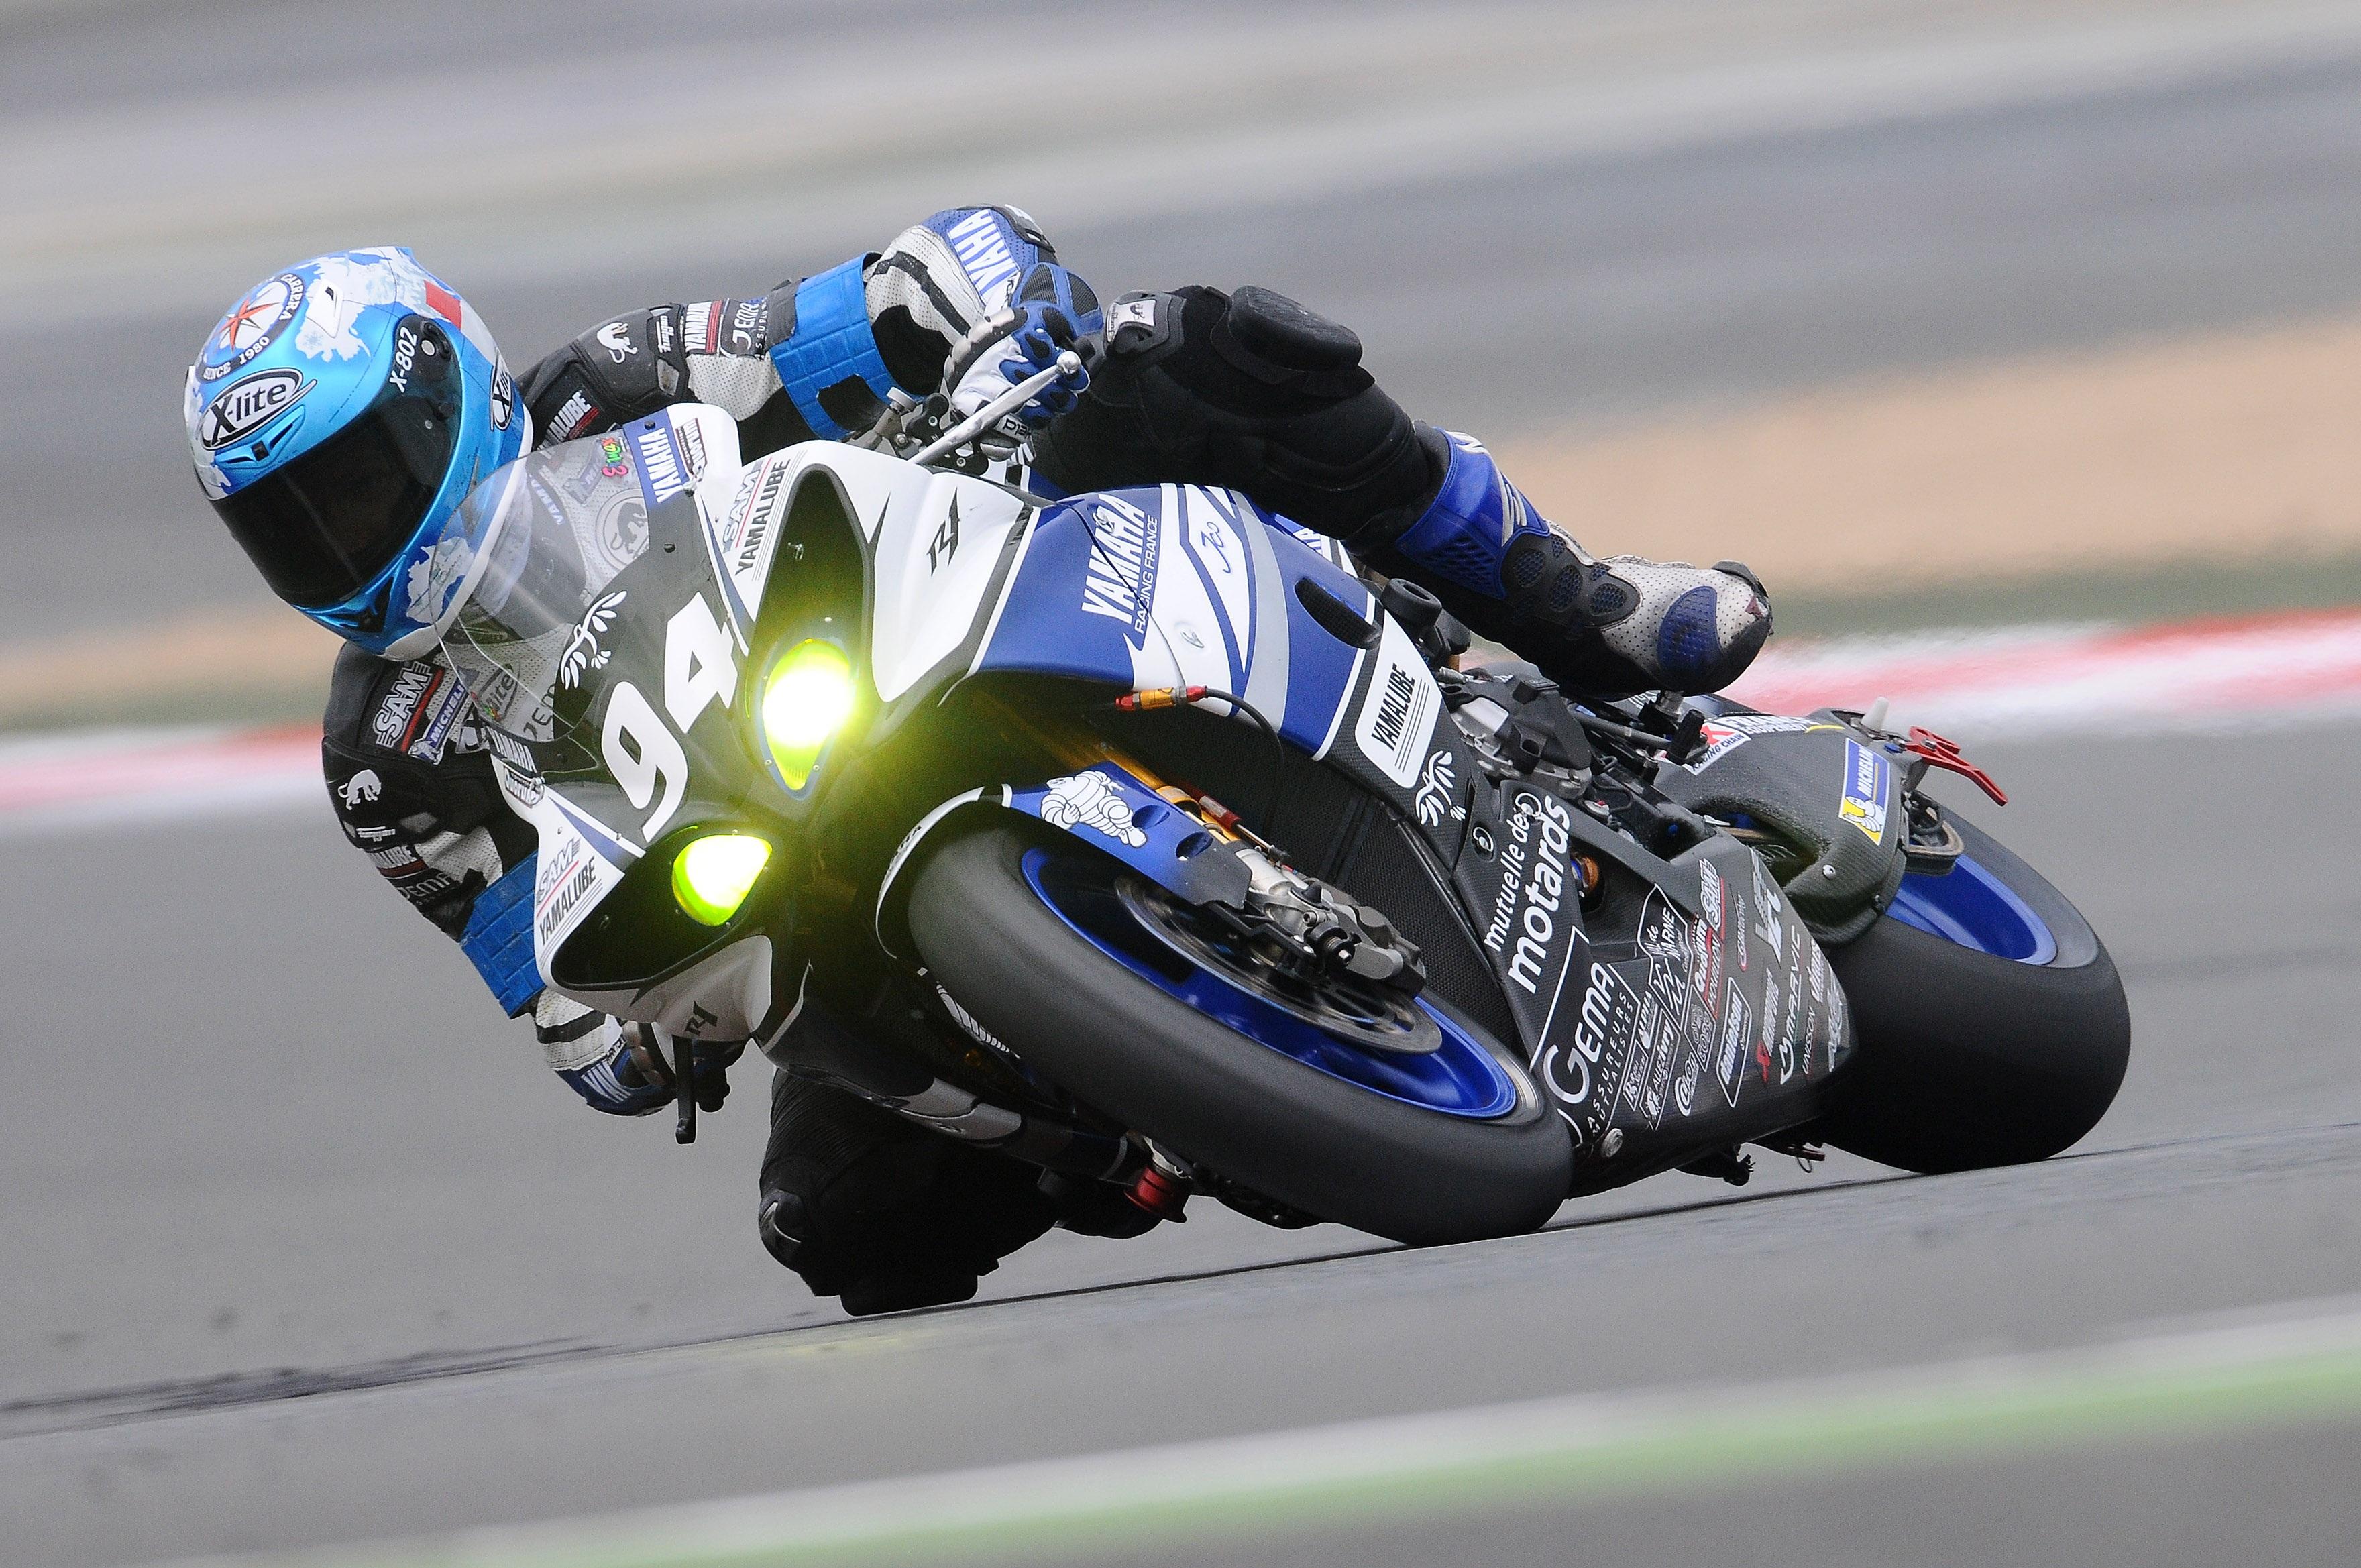 racing bike race motorcycle sport rider sports cycle ride track motorbike racer speed road biker superbike tt prix grand motorsport